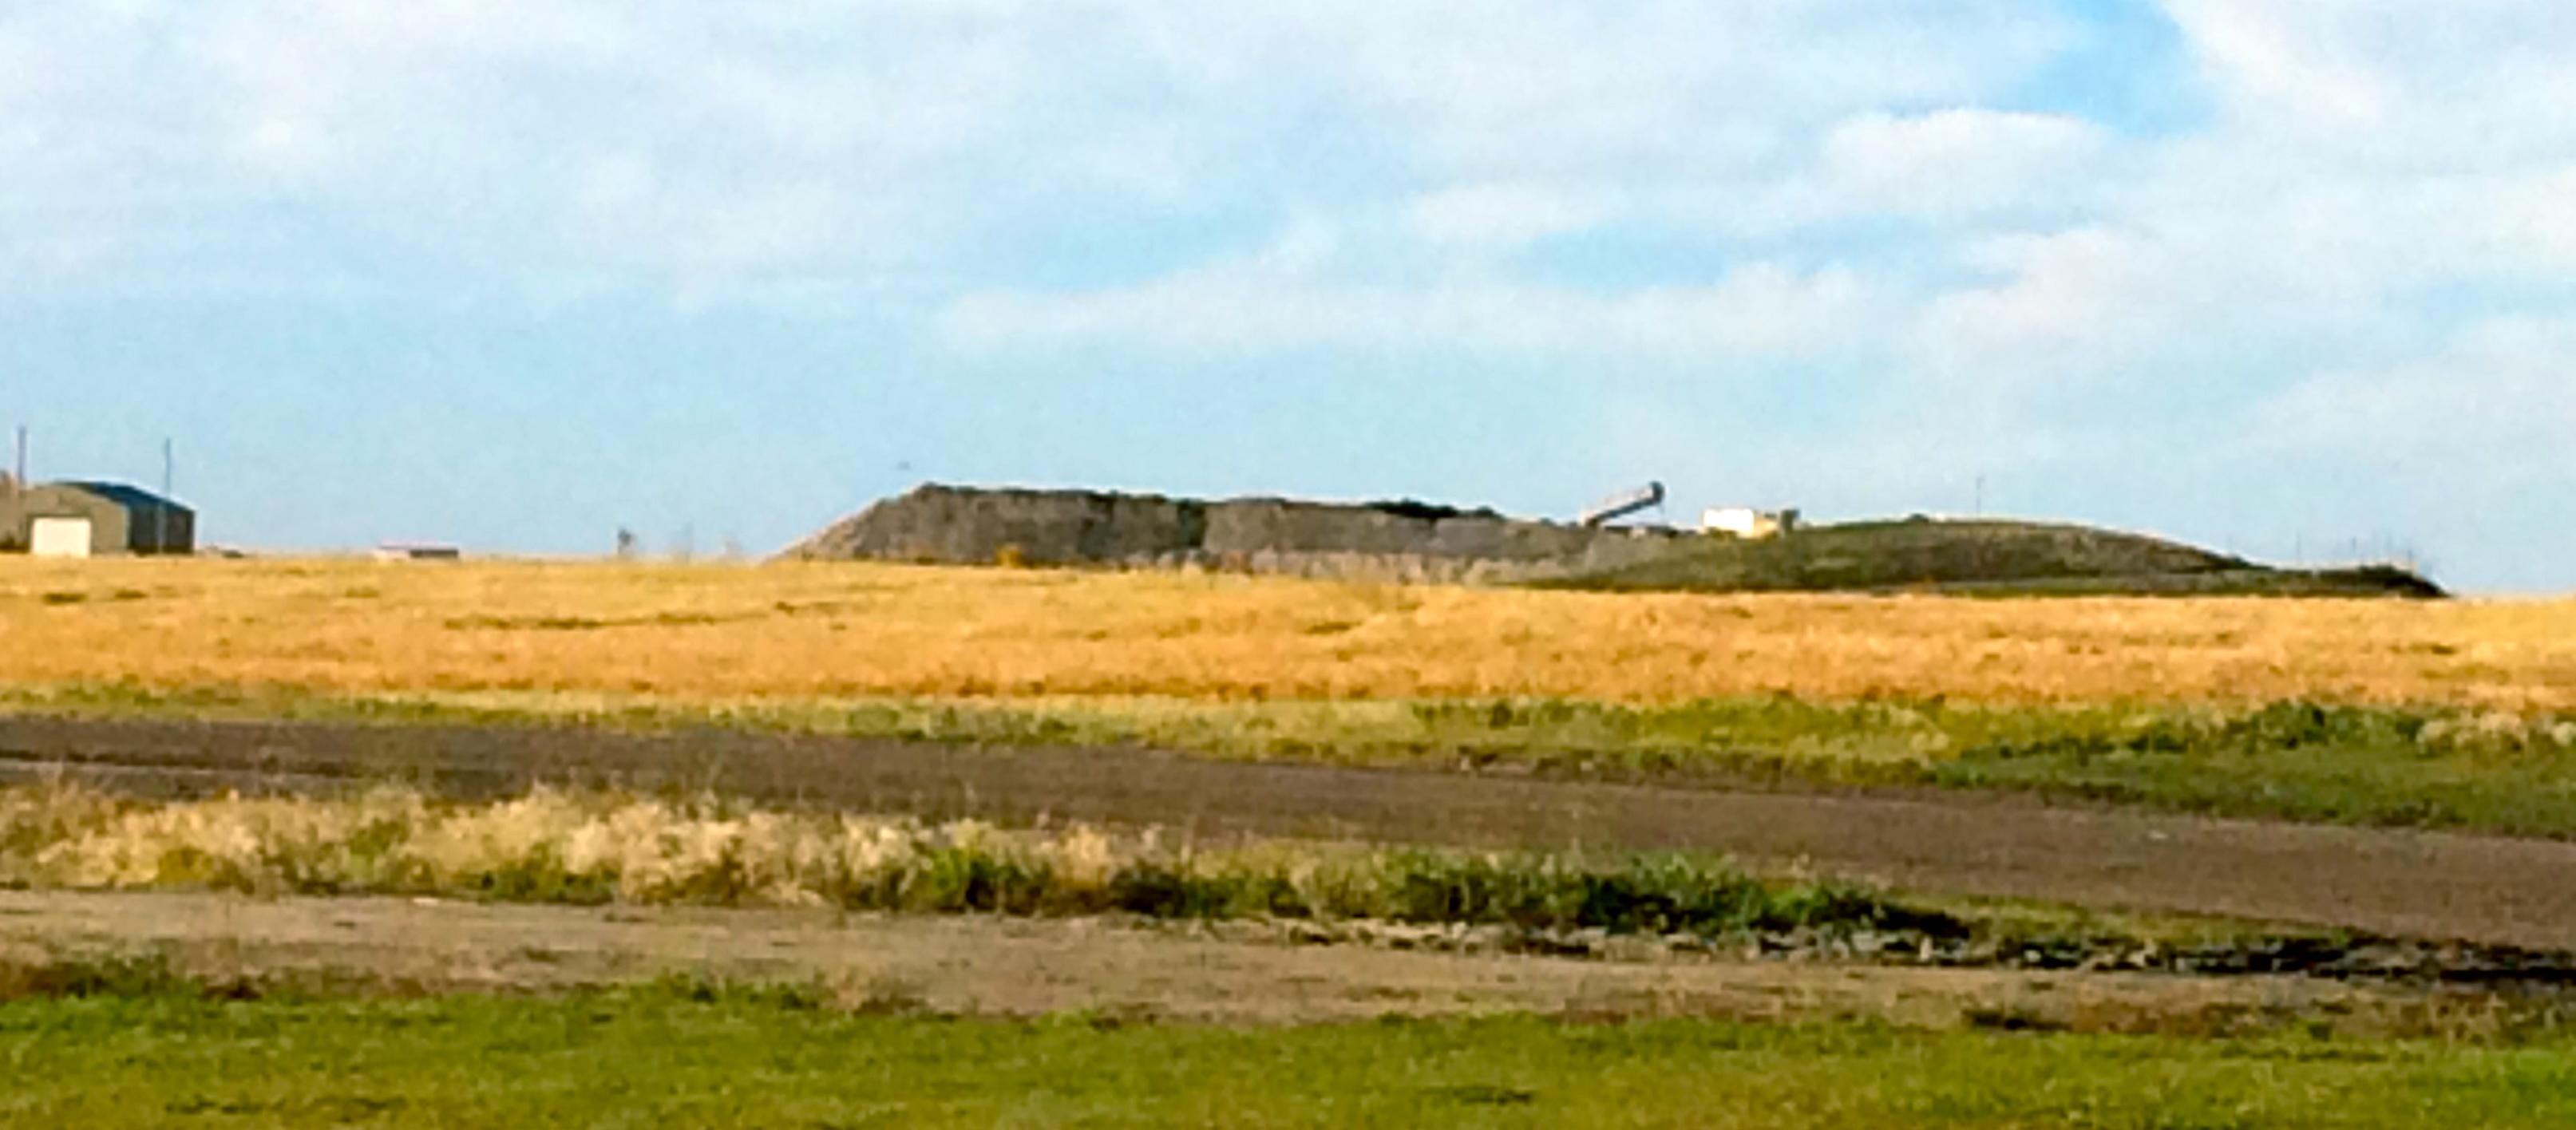 2016-09-27-toxic-oilfield-waste-piles-at-didsbury-landfill-alberta